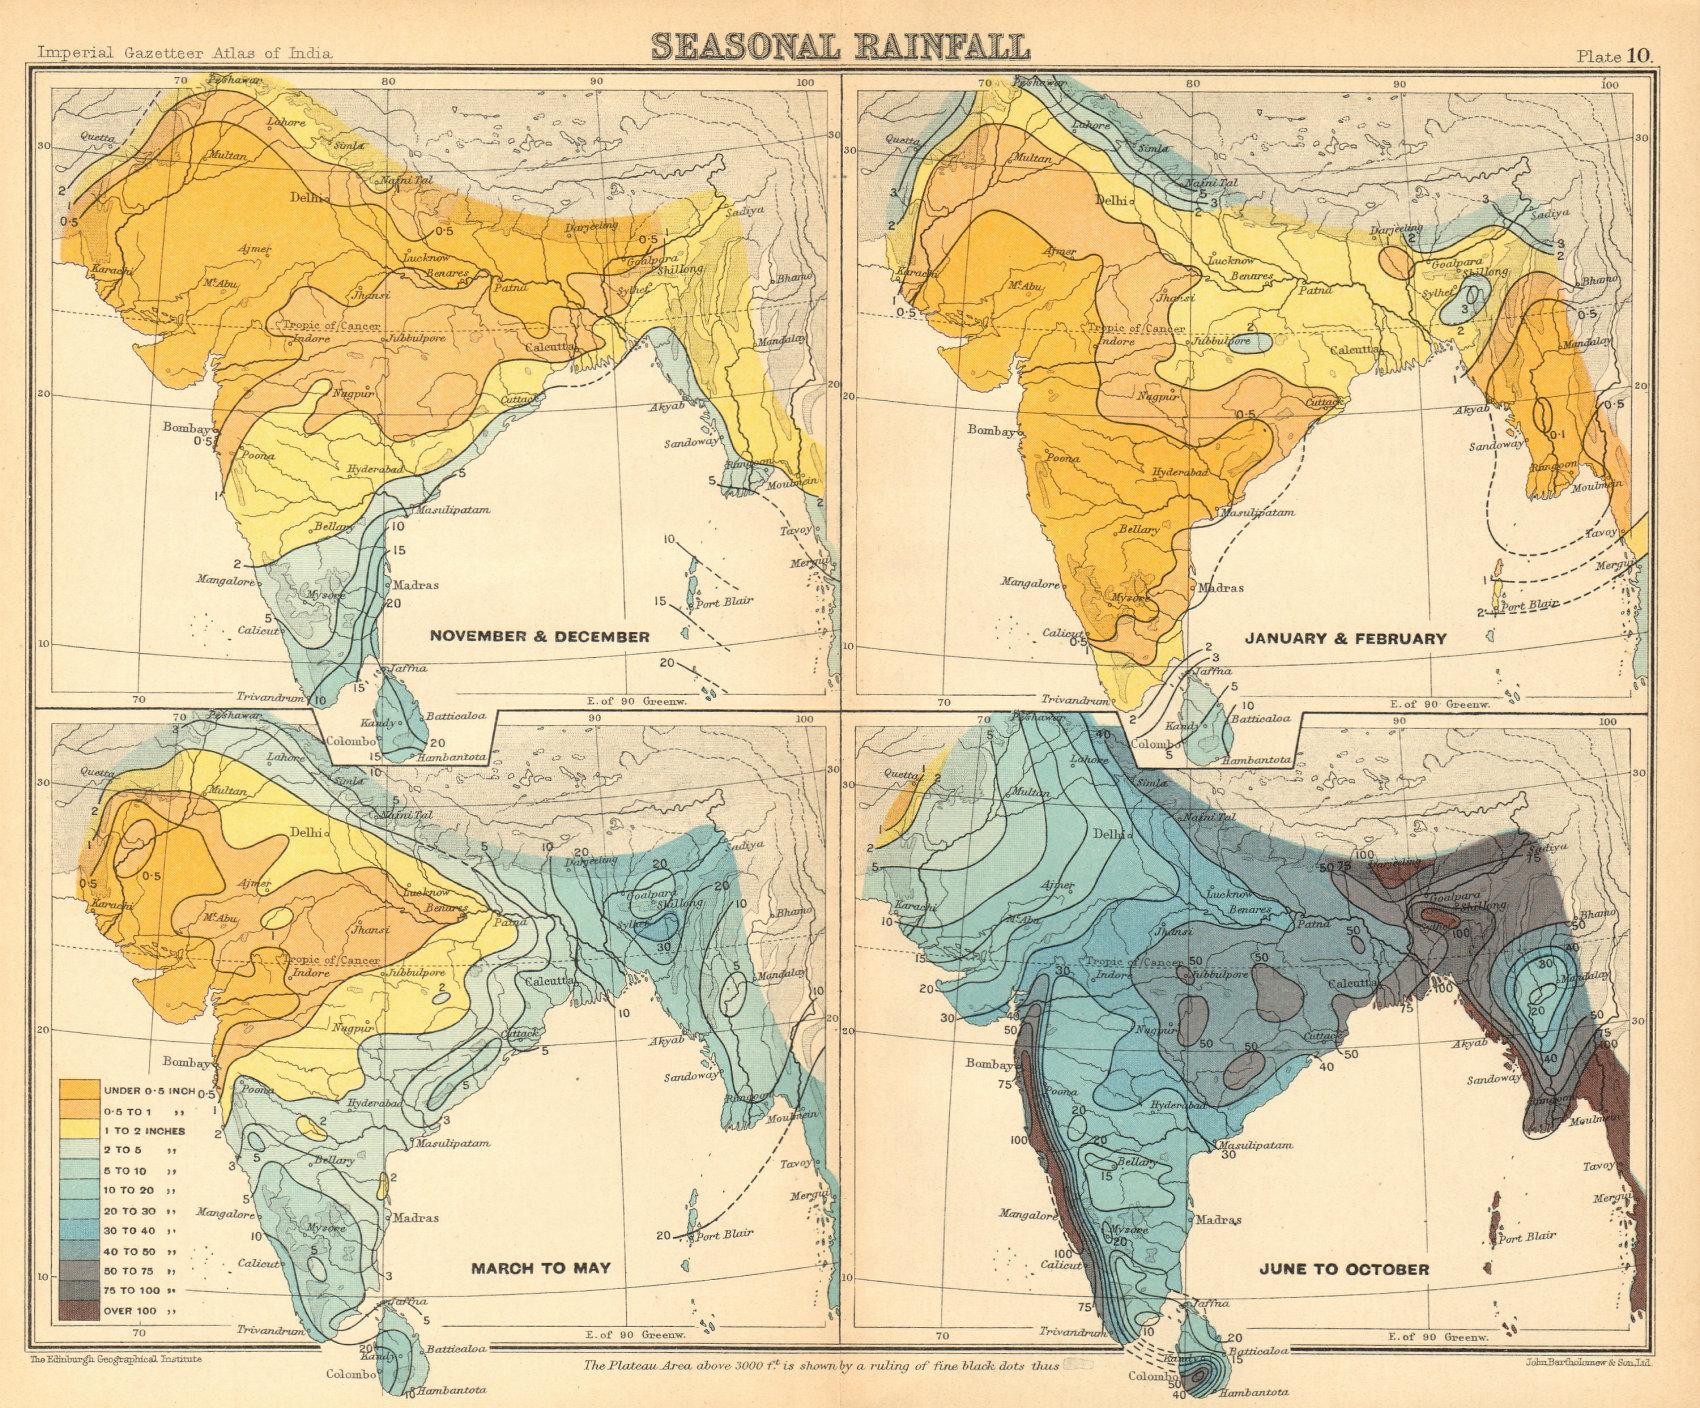 SOUTH ASIA. British India & Burma. Seasonal Rainfall 1931 old vintage map